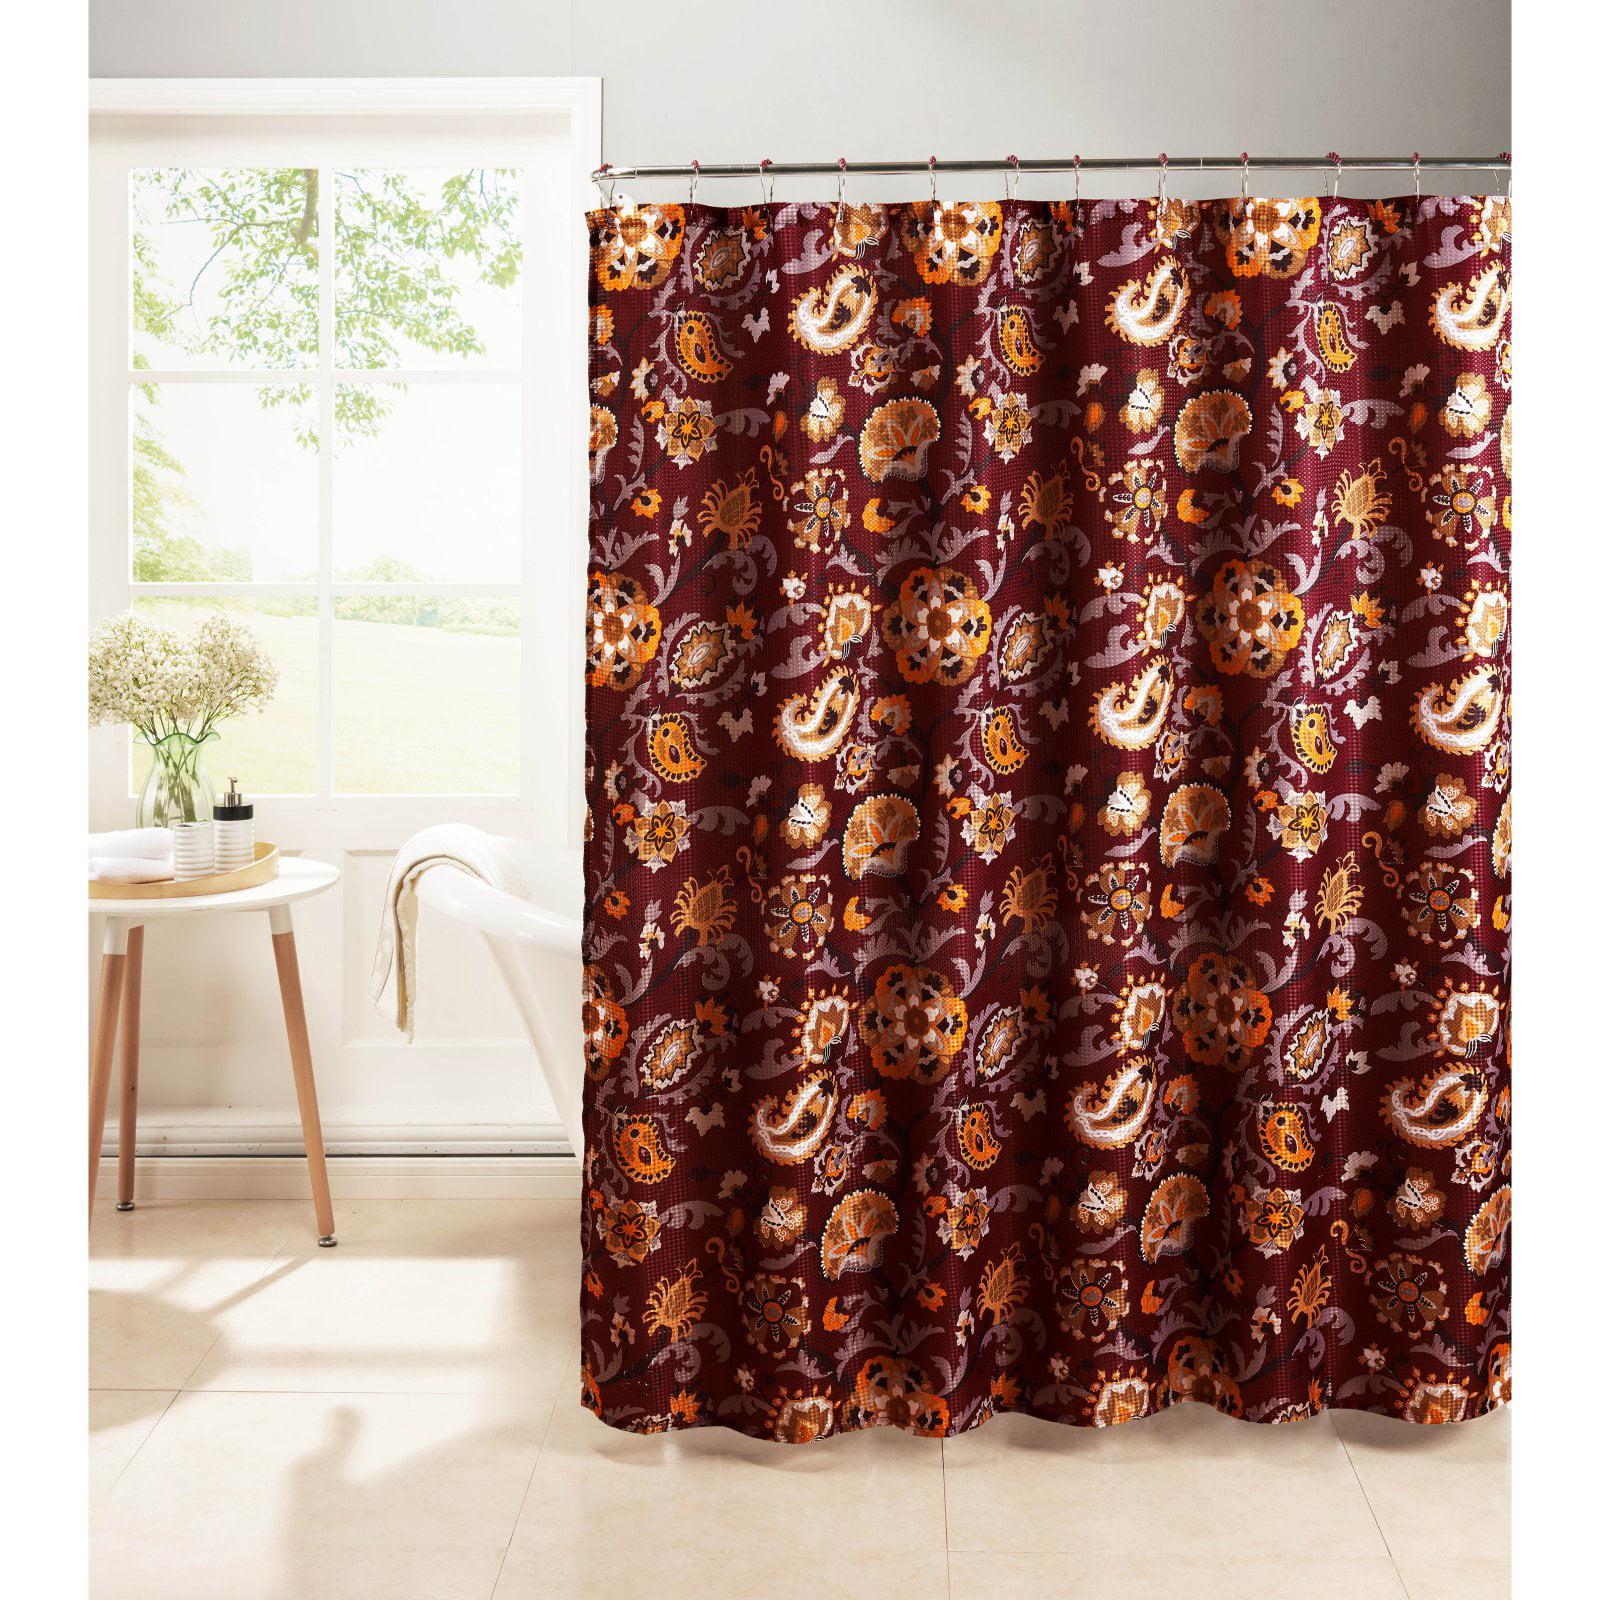 Henna Diamond Weave Textured Shower Curtain with Metal Roller Hooks